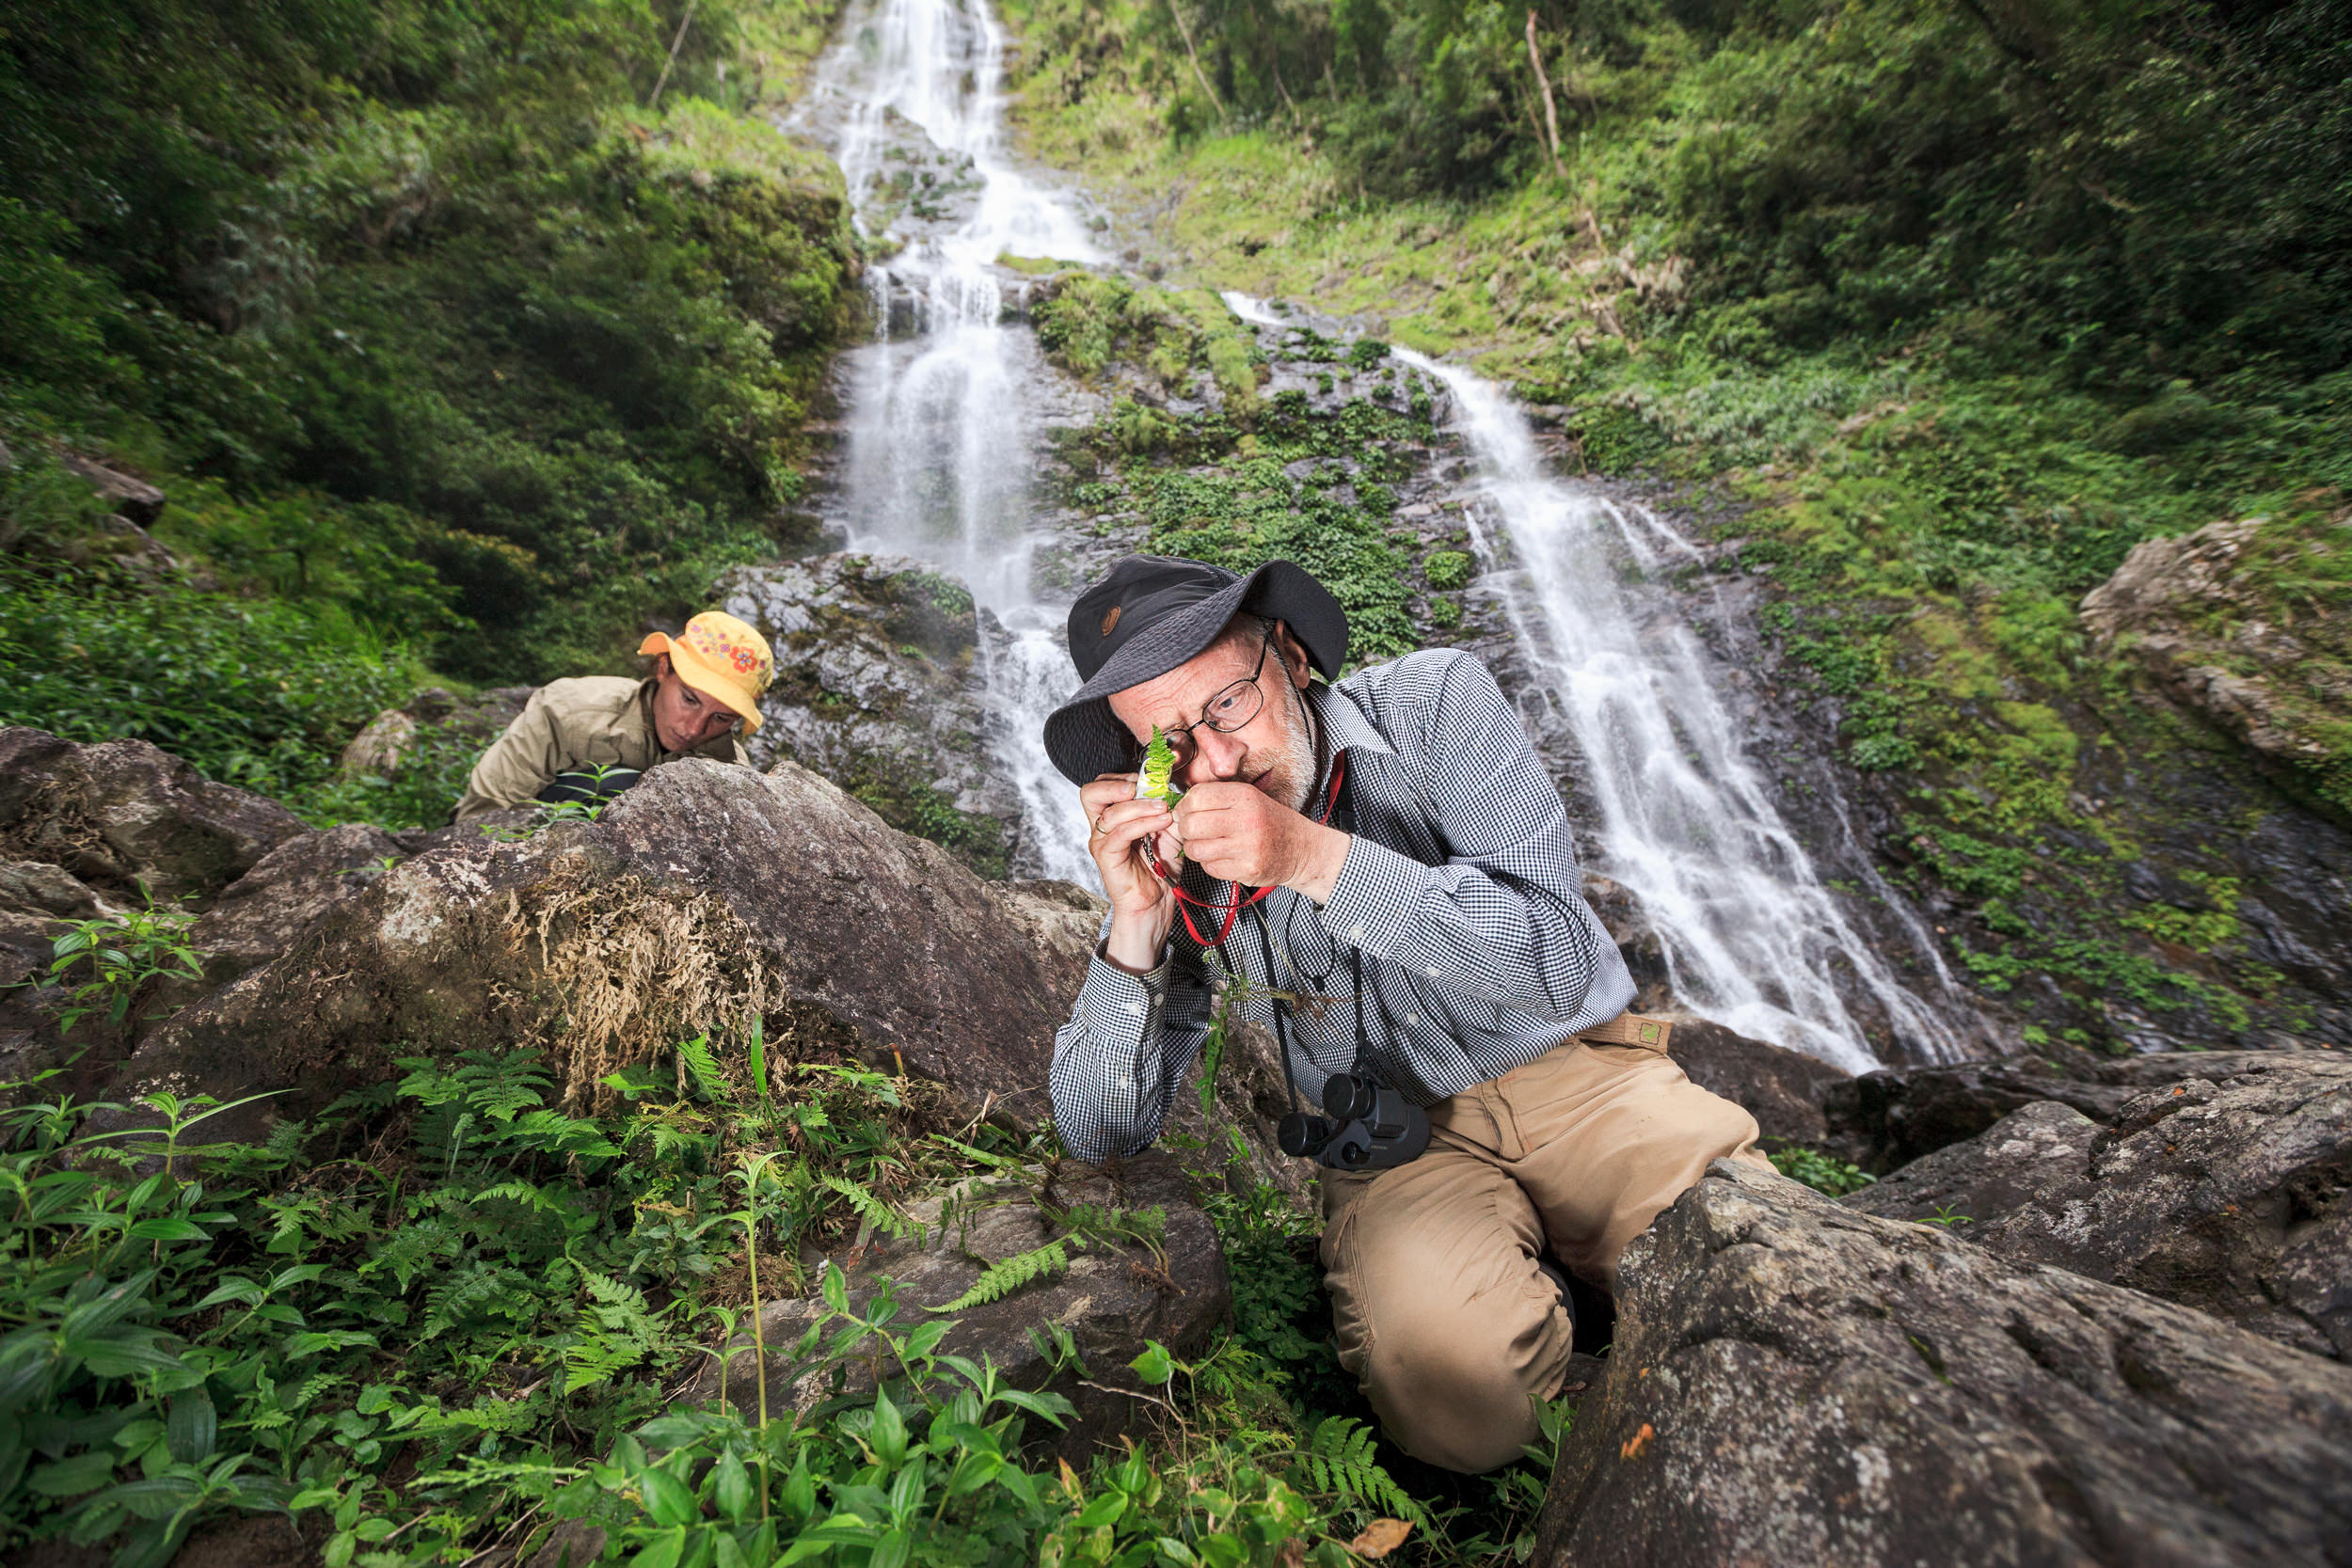 Botanist Peter Hovenkamp studies a fern at the base of the Langanan waterfall on Mount Kinabalu, Borneo